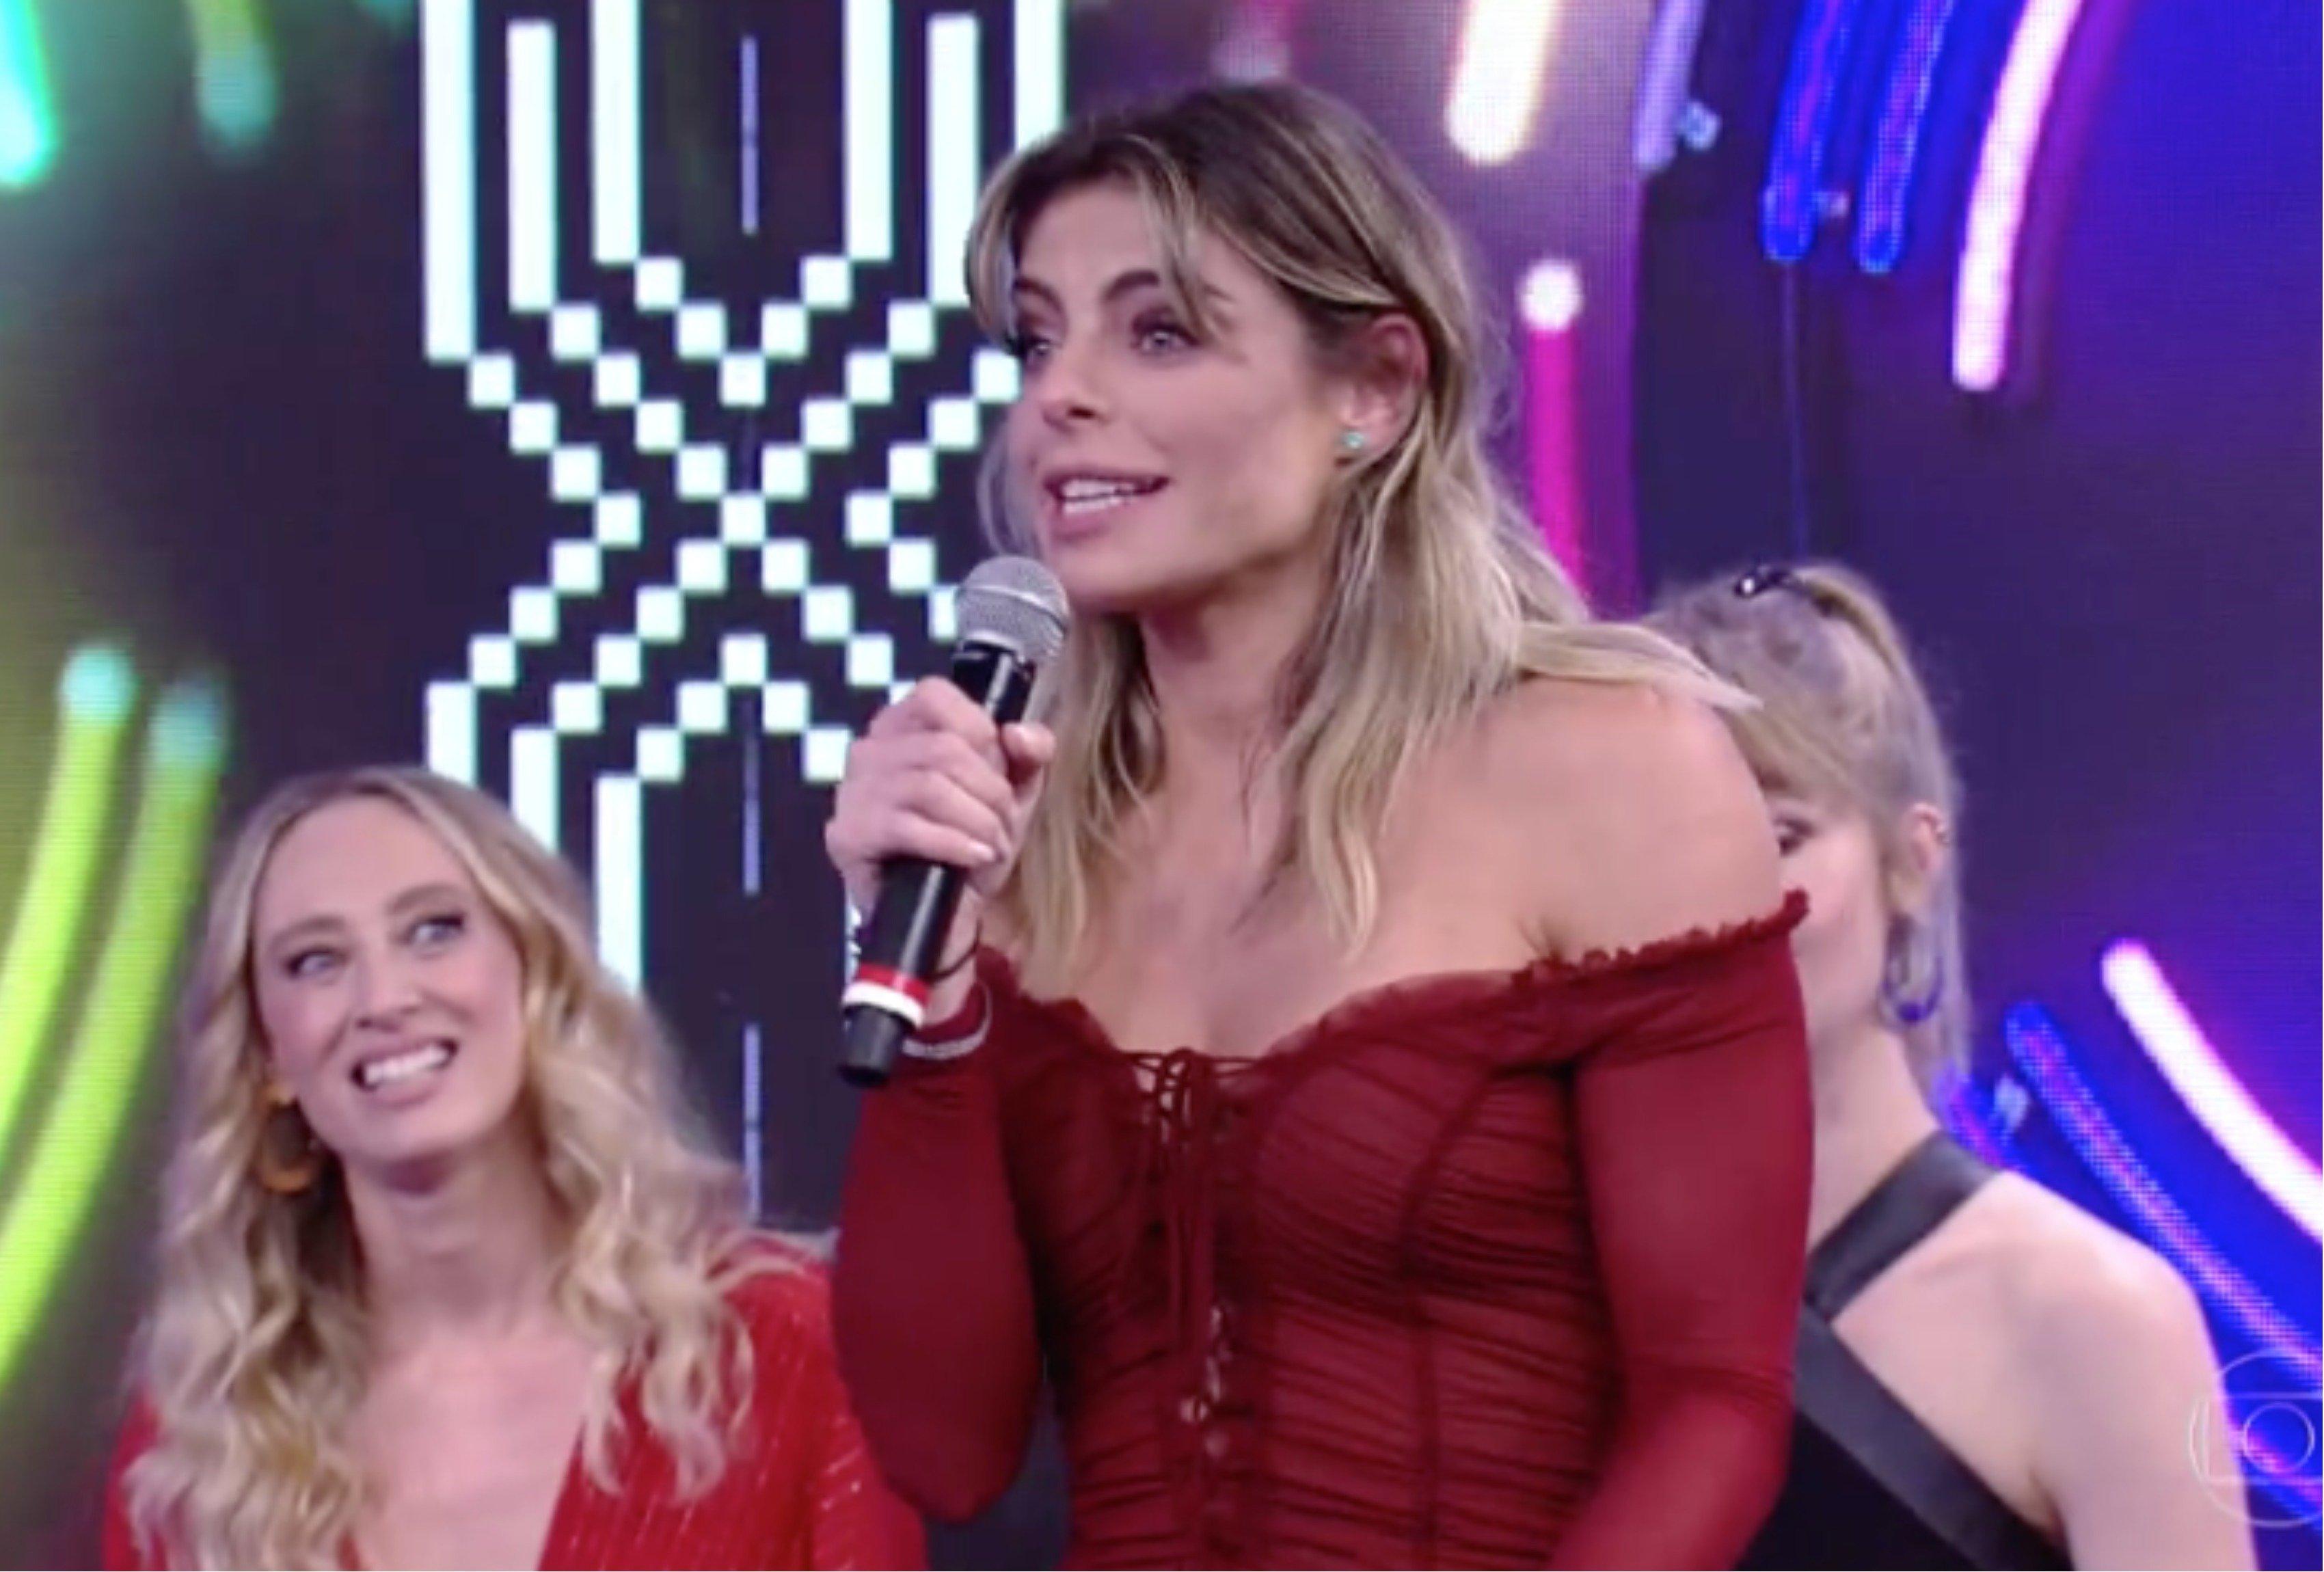 Daniela Cicarelli nude (71 pics), photo Sideboobs, Snapchat, underwear 2018